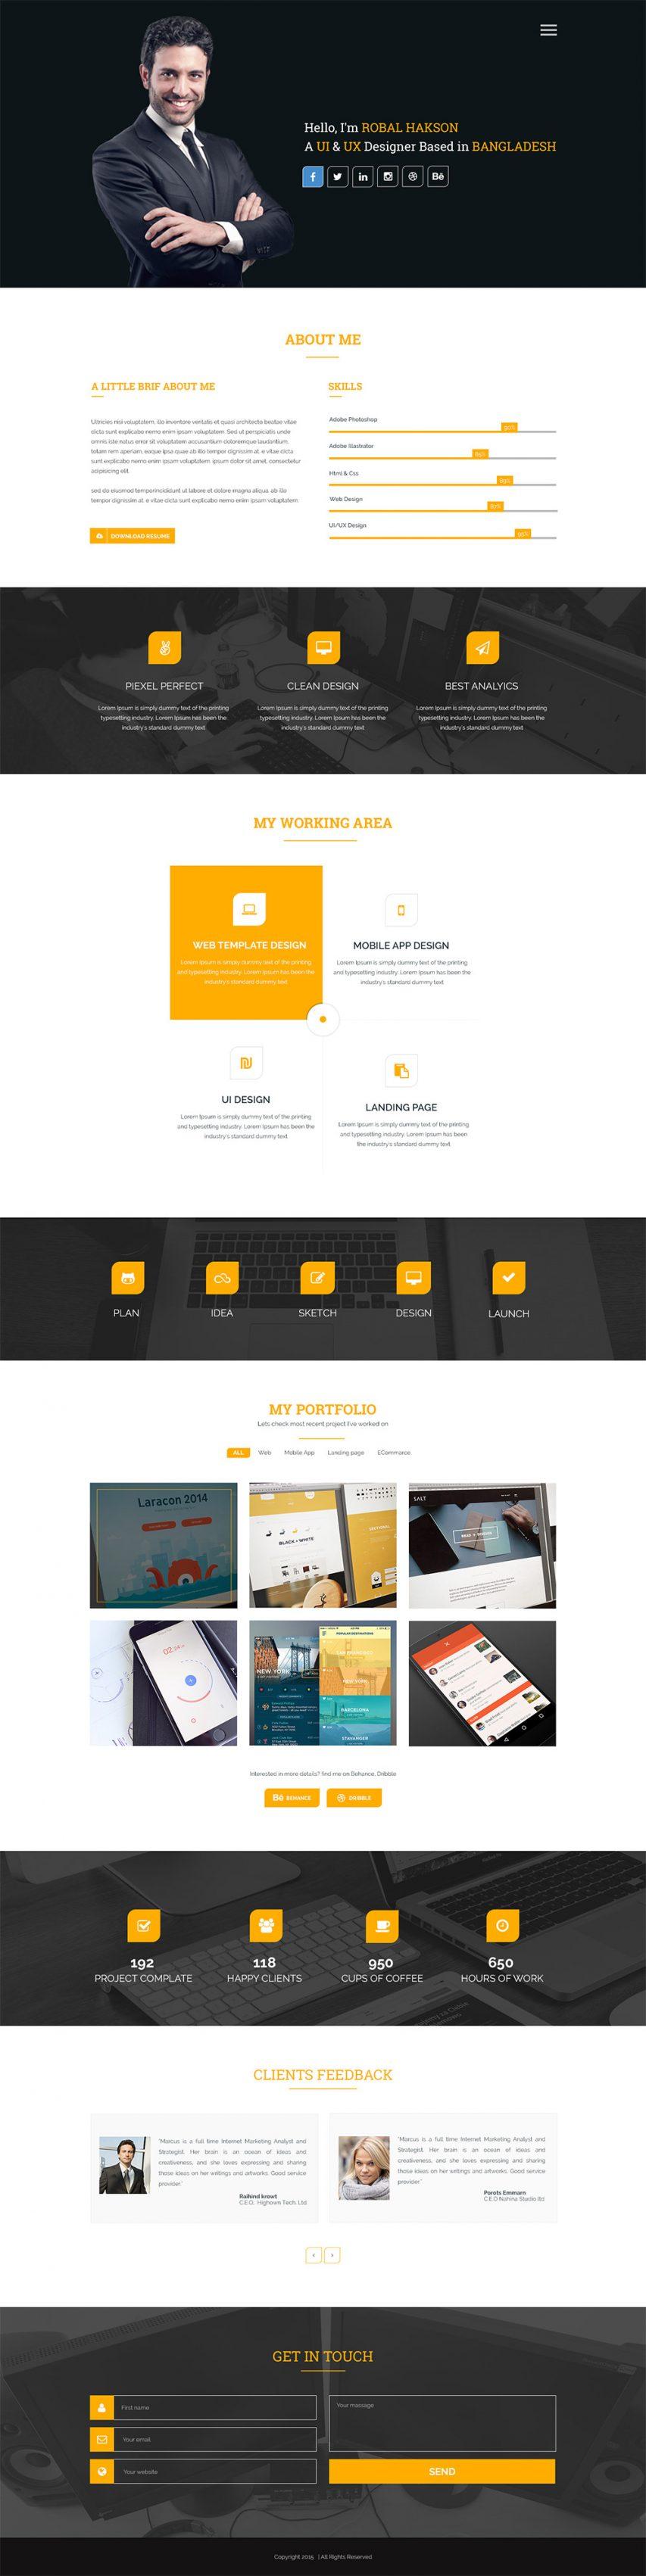 Clean One Page Corporate Portfolio Website